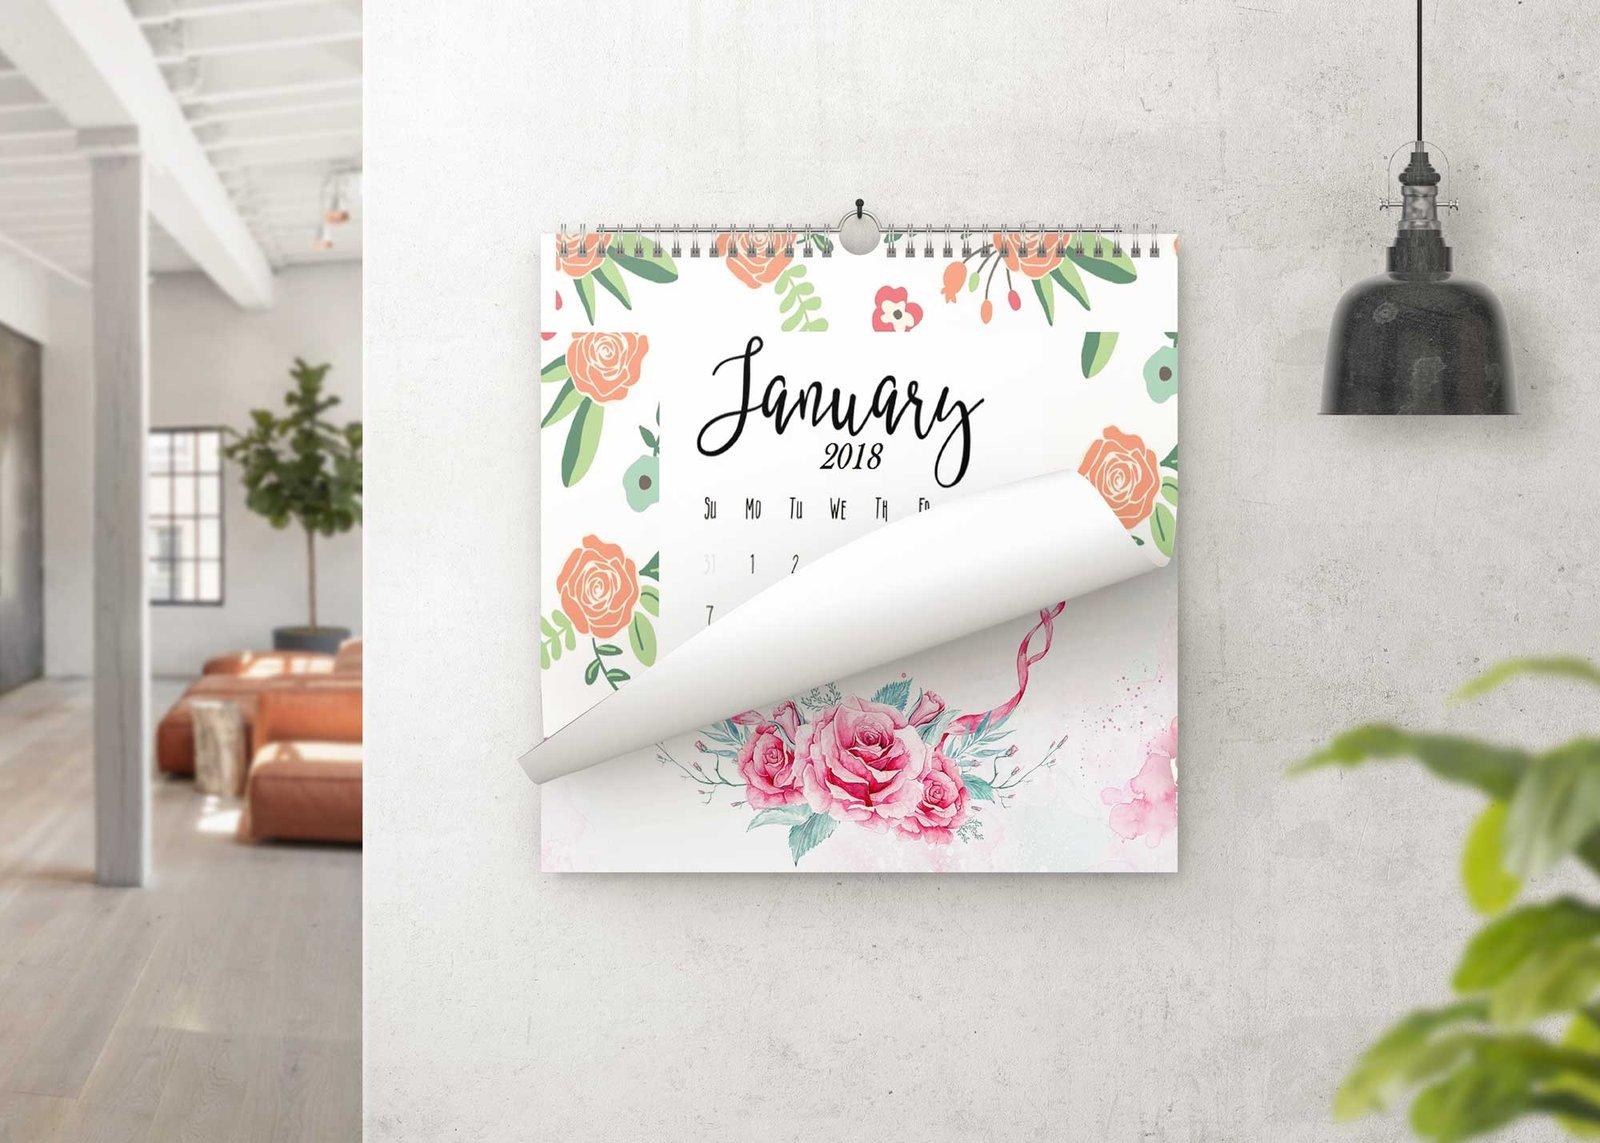 Square Wall Hanging Calendar Design Mockup | eyMockup